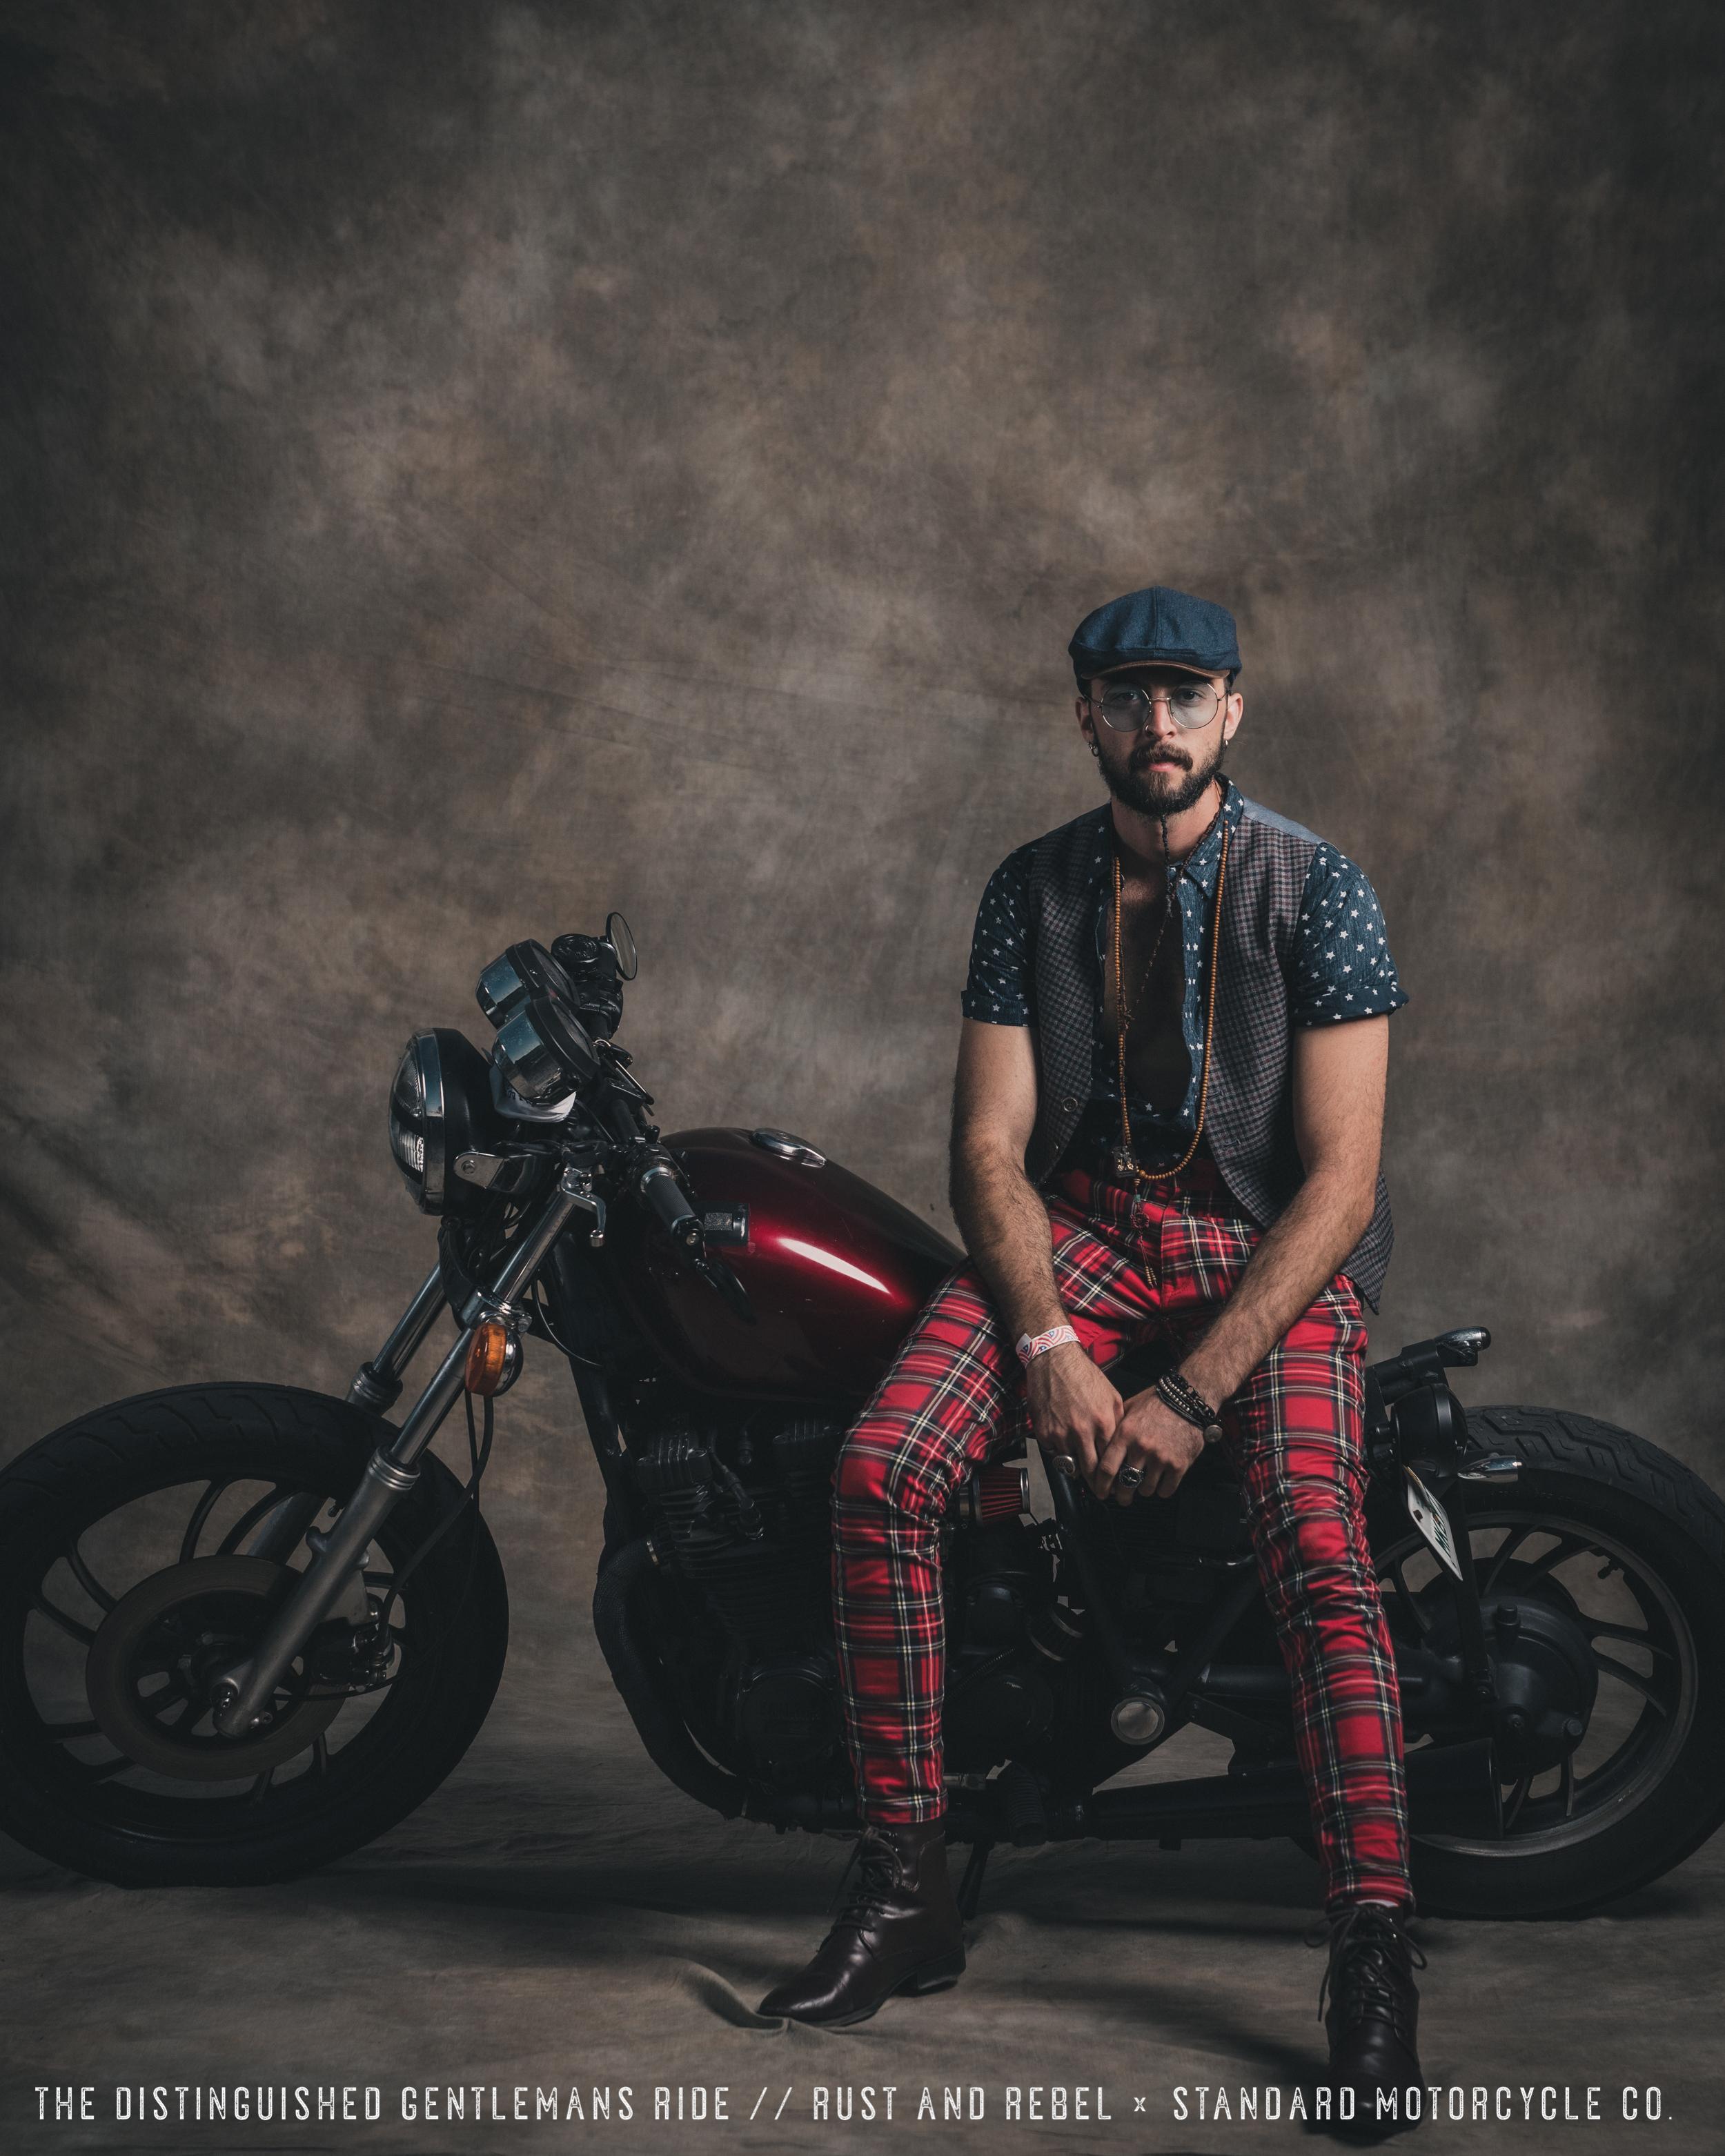 The Distinguished Gentleman's Ride 2019 [PEOPLE - PHOTO BY @MIKEDUNNUSA] - 0156.jpg